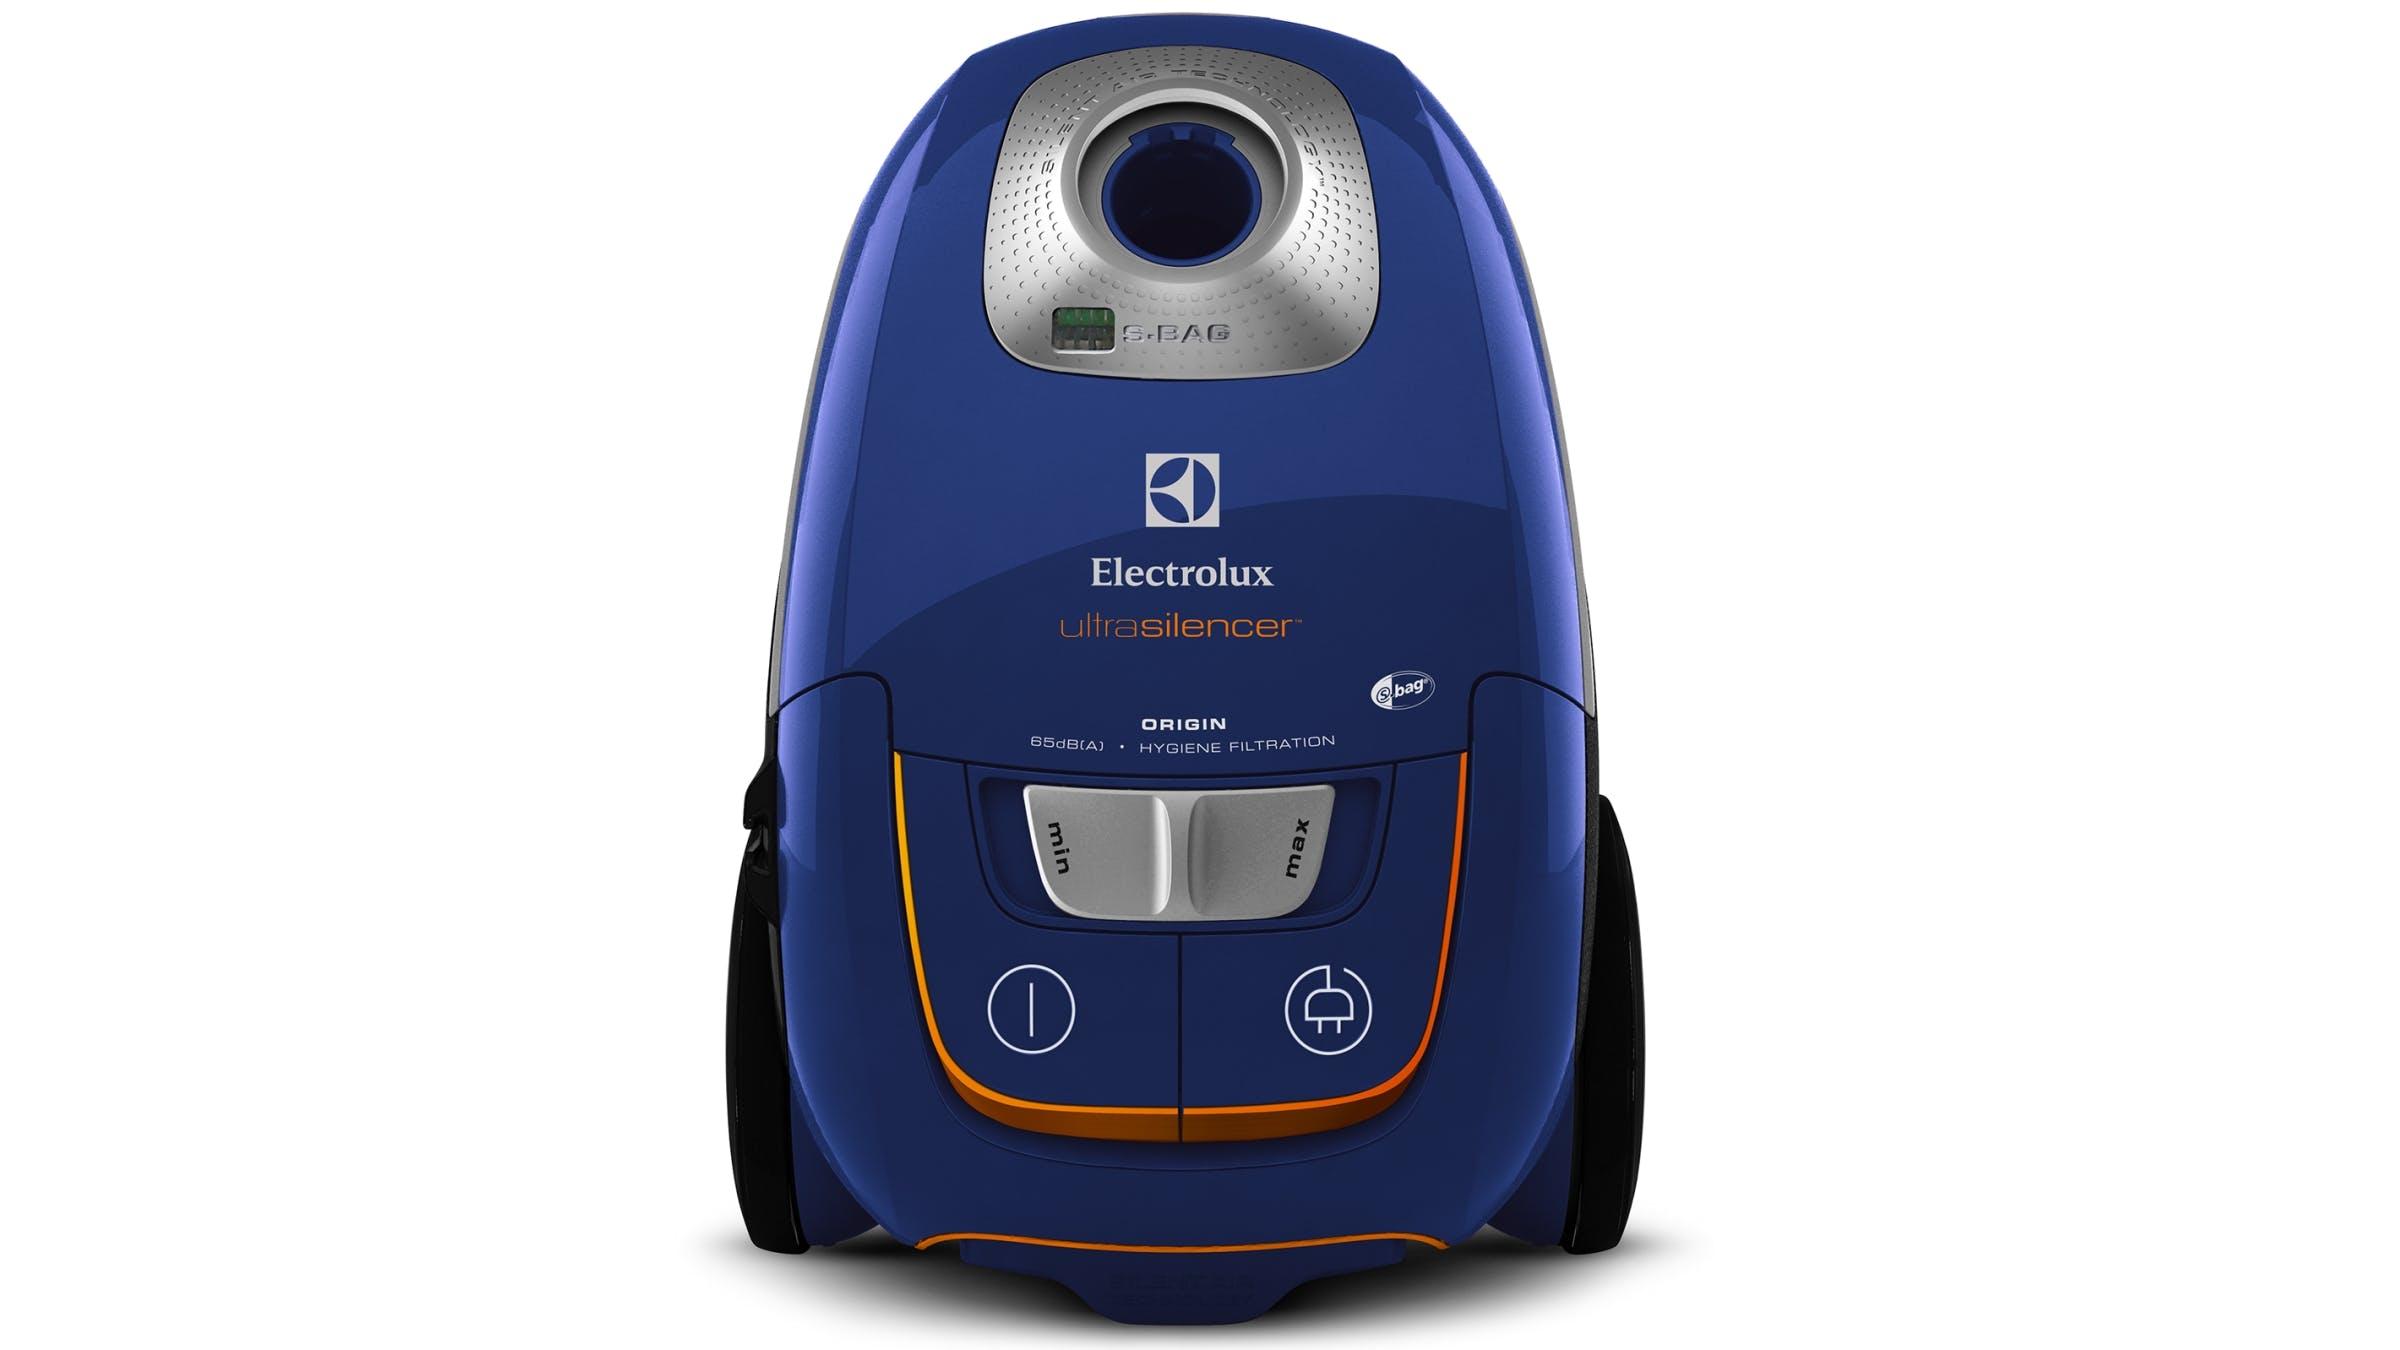 Electrolux Zus4065or Ultrasilencer Vacuum Cleaner Harvey